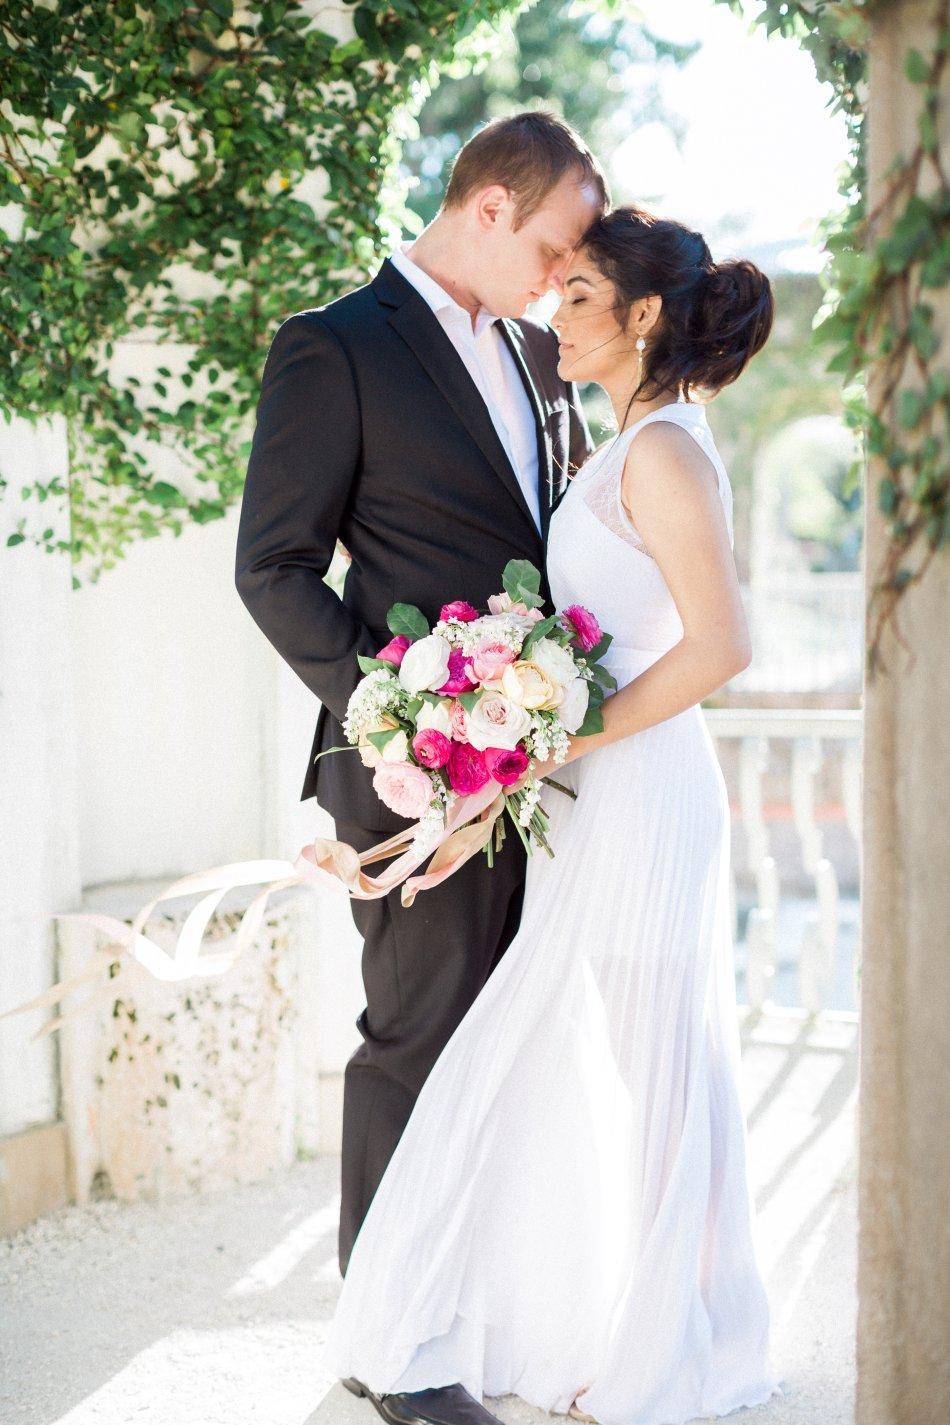 vizcaya-miami-wedding-photographer-florida-luxury-engagement_0375.jpg